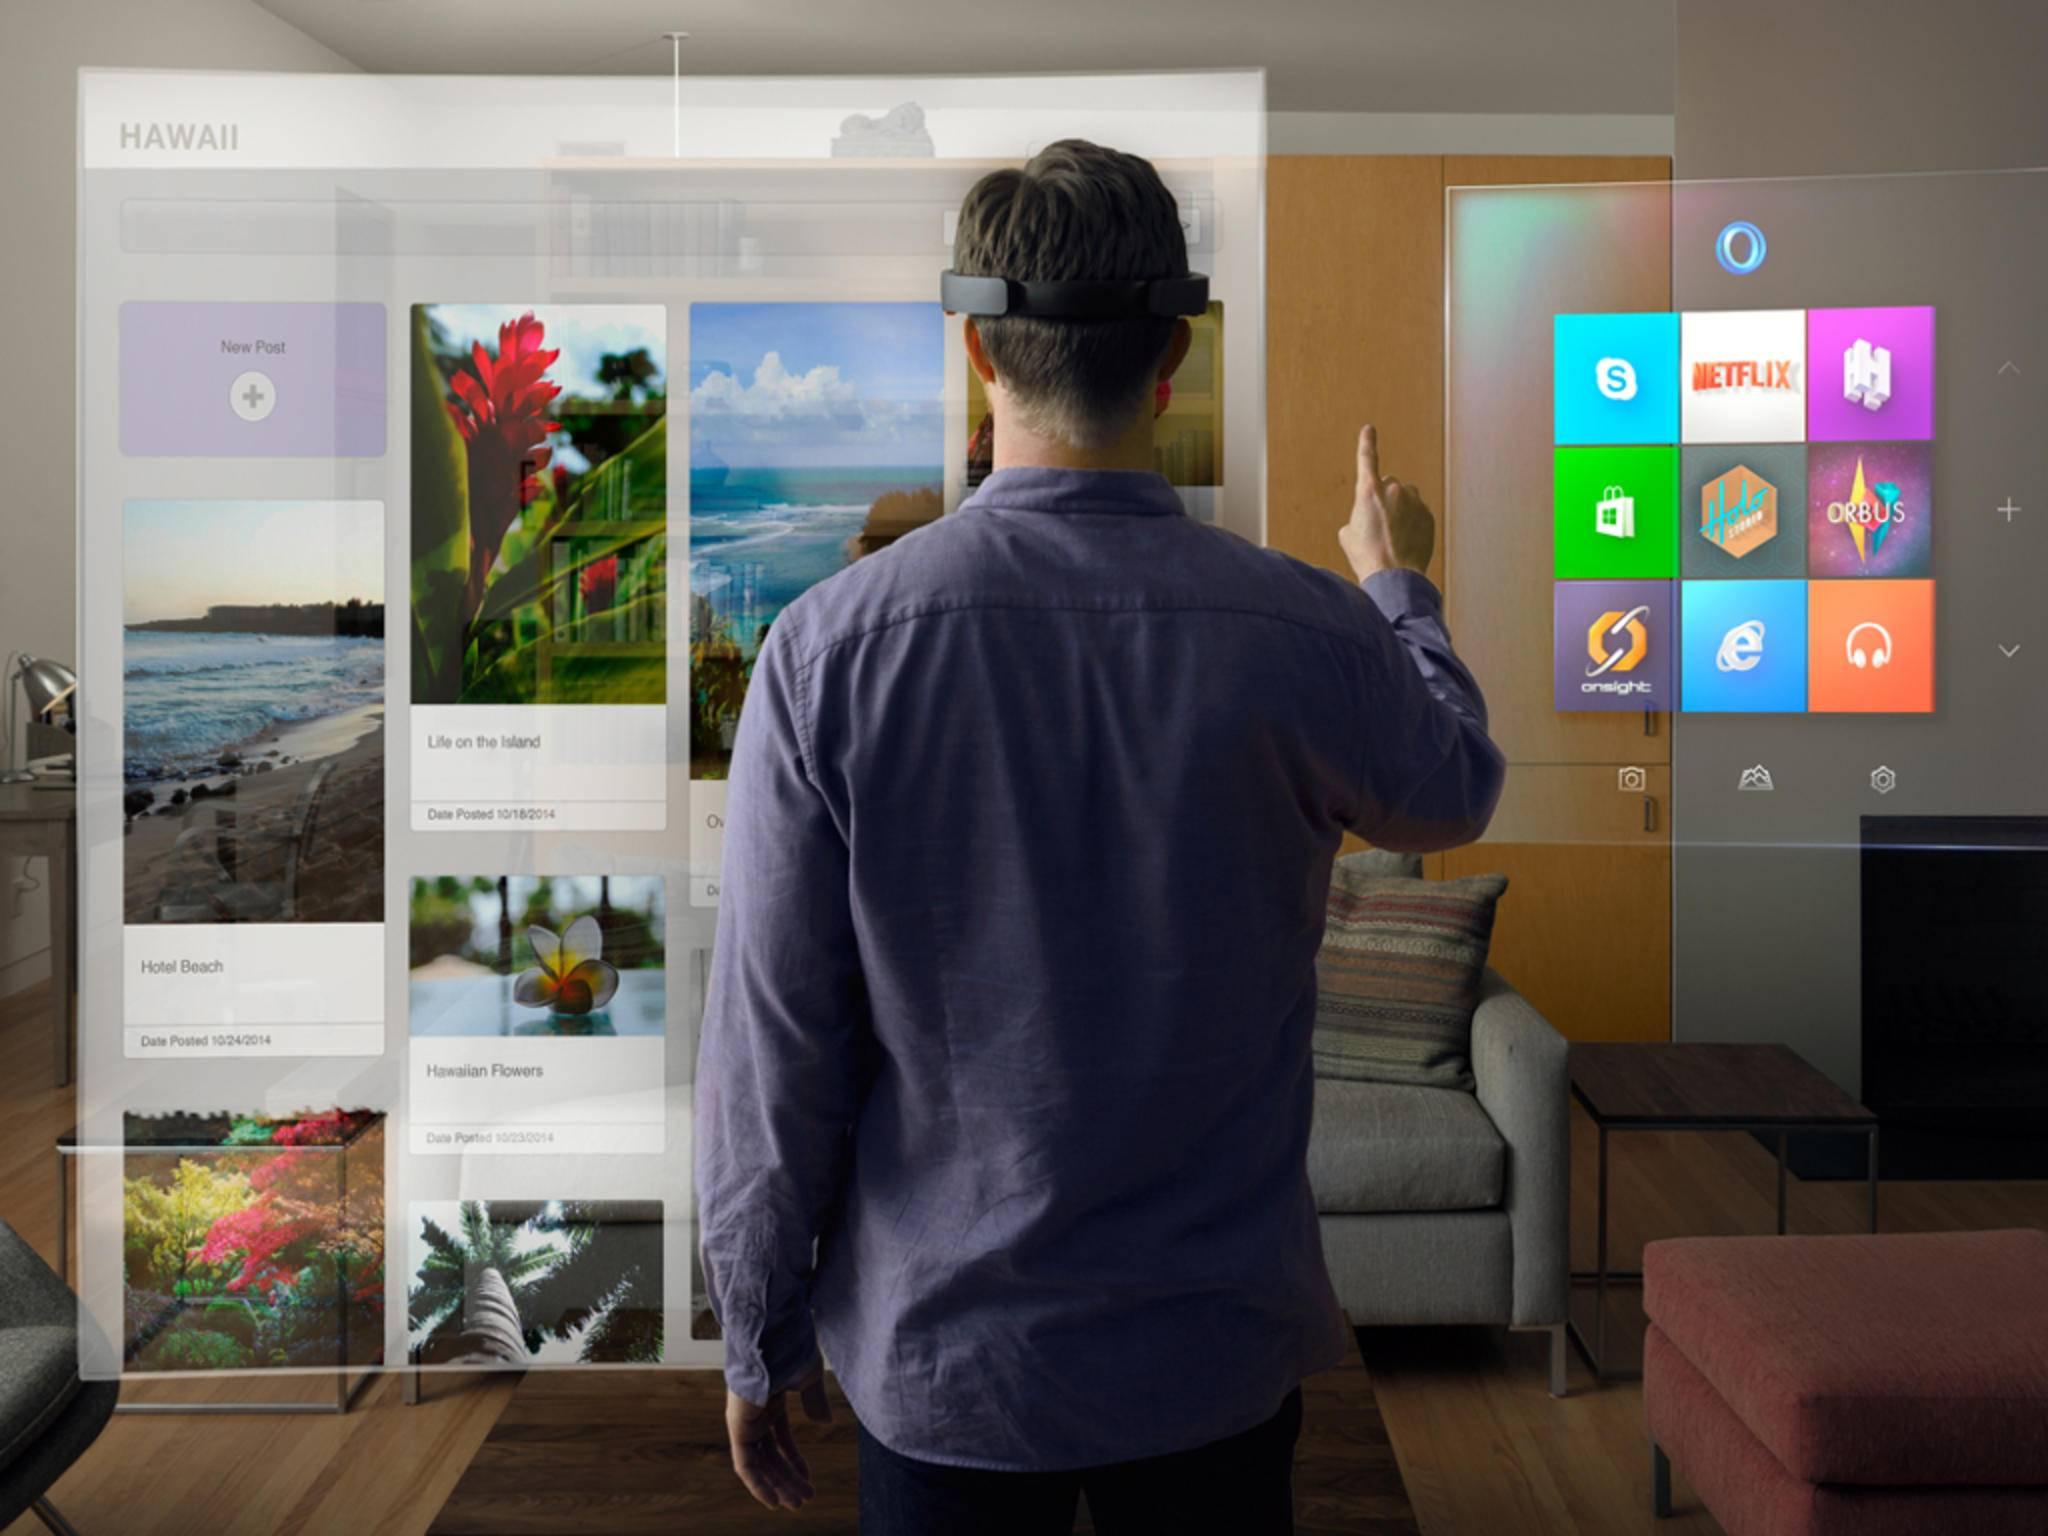 Mit Windows 10 will Microsoft an alte Erfolge anknüpfen.